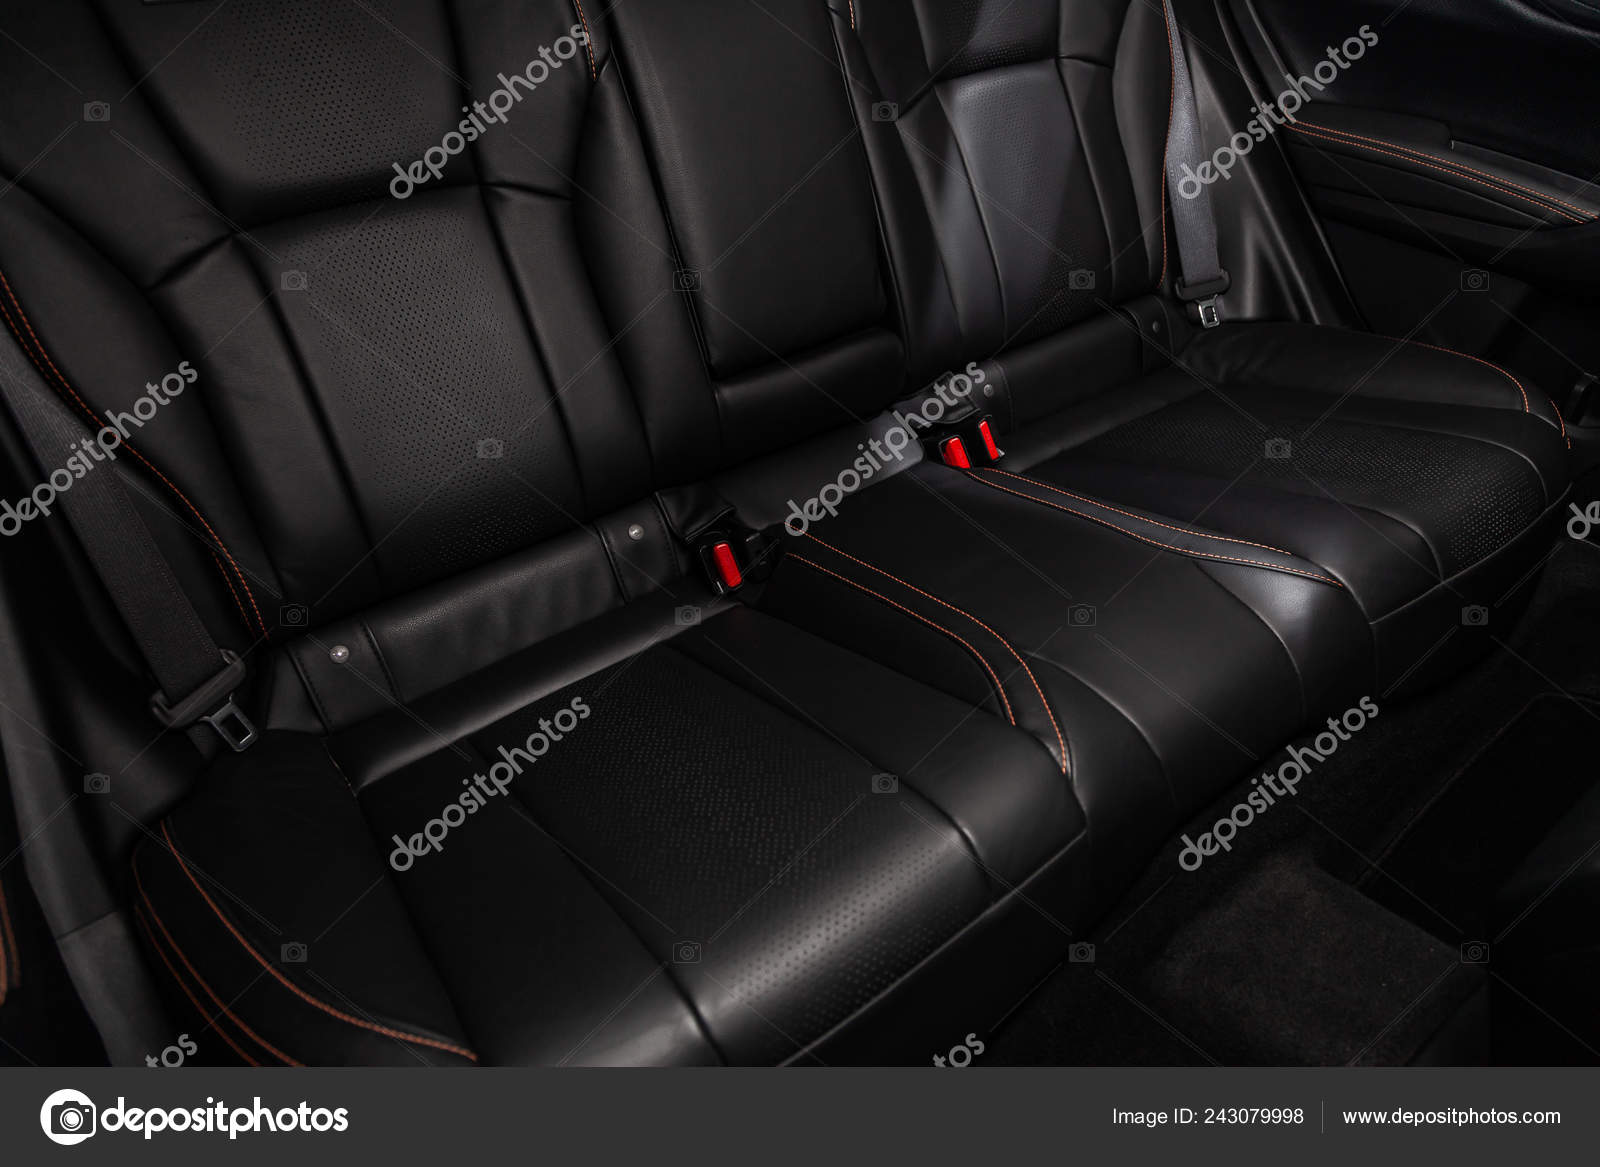 Phenomenal Novosibirsk Russia February 2019 Subaru Close Rear Seats Ibusinesslaw Wood Chair Design Ideas Ibusinesslaworg